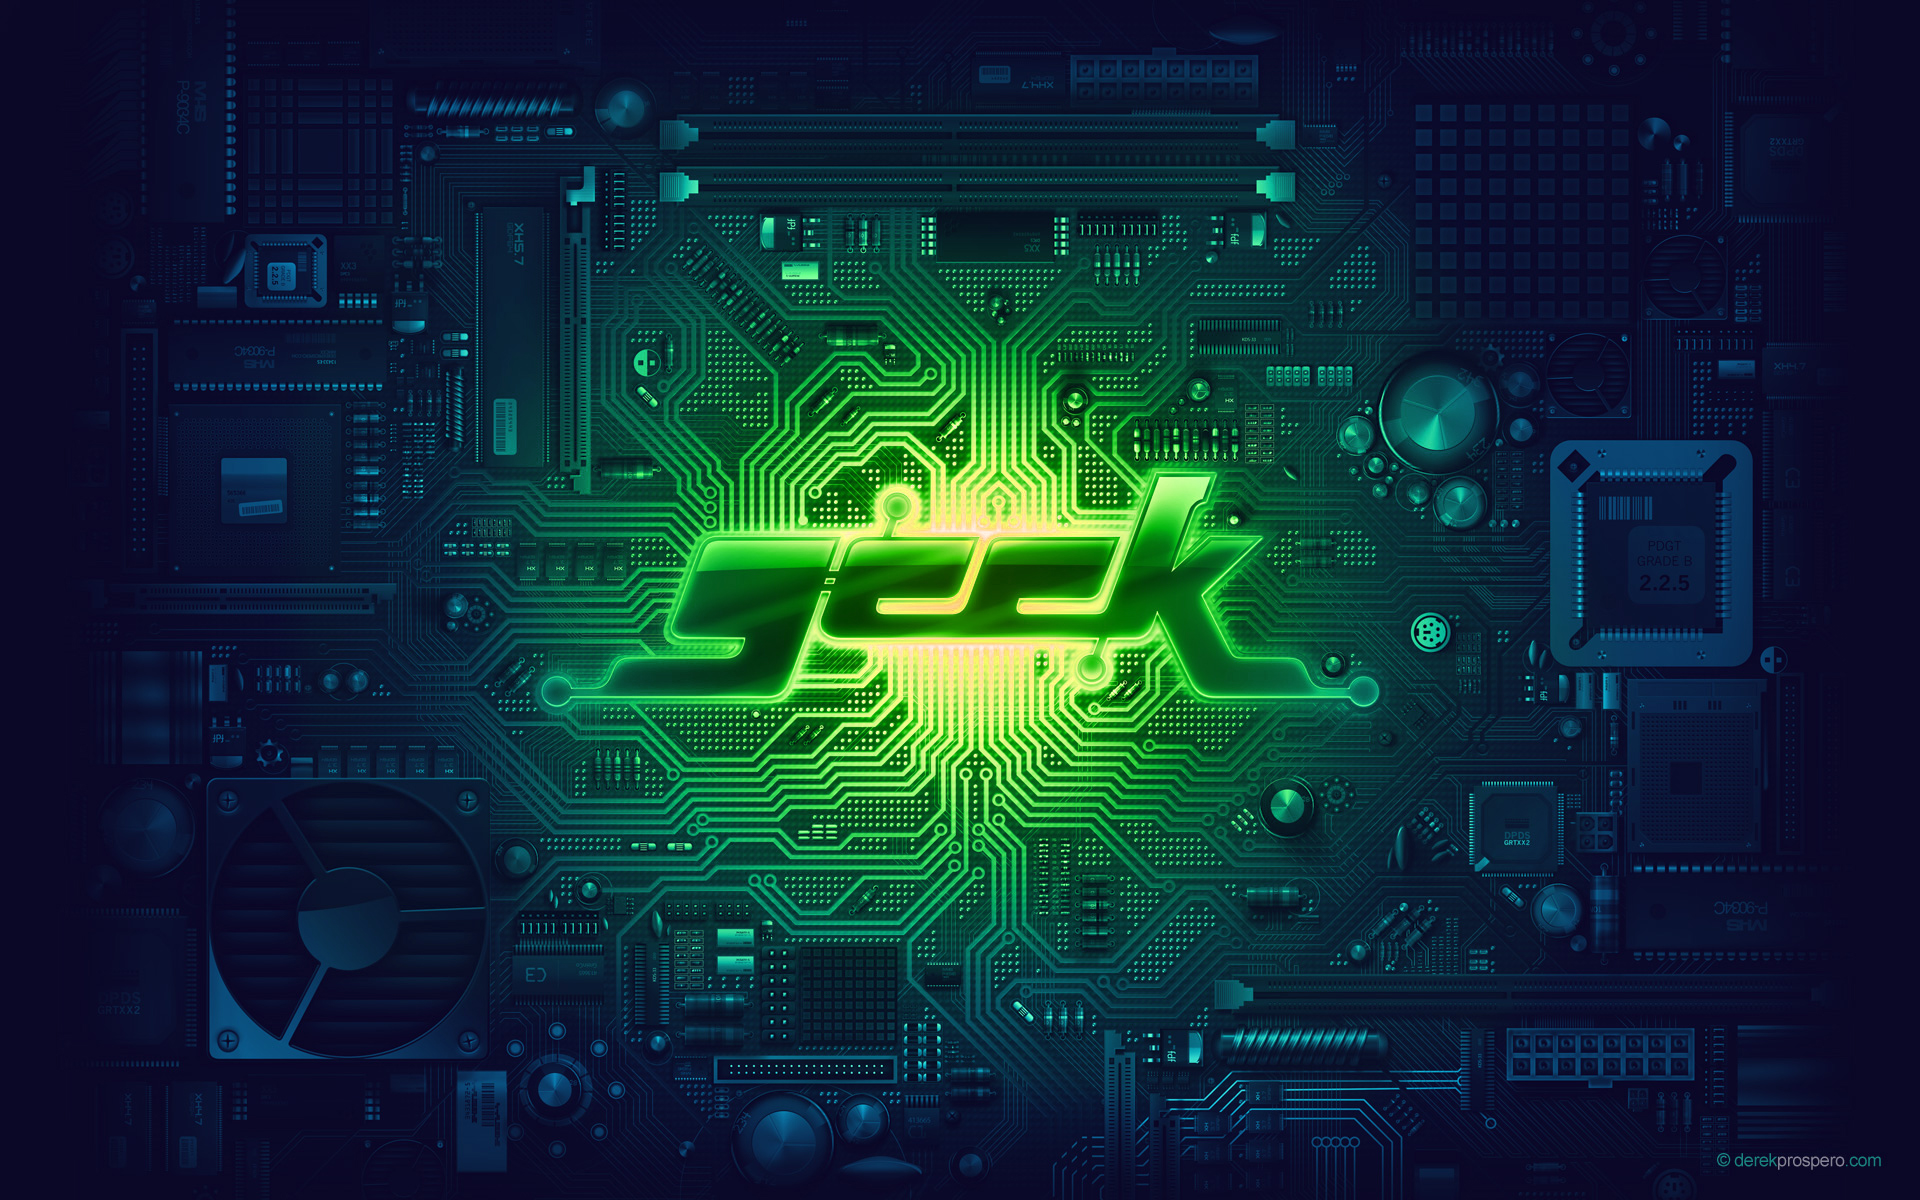 geek motherboard HD Wallpaper   General 351240 1920x1200